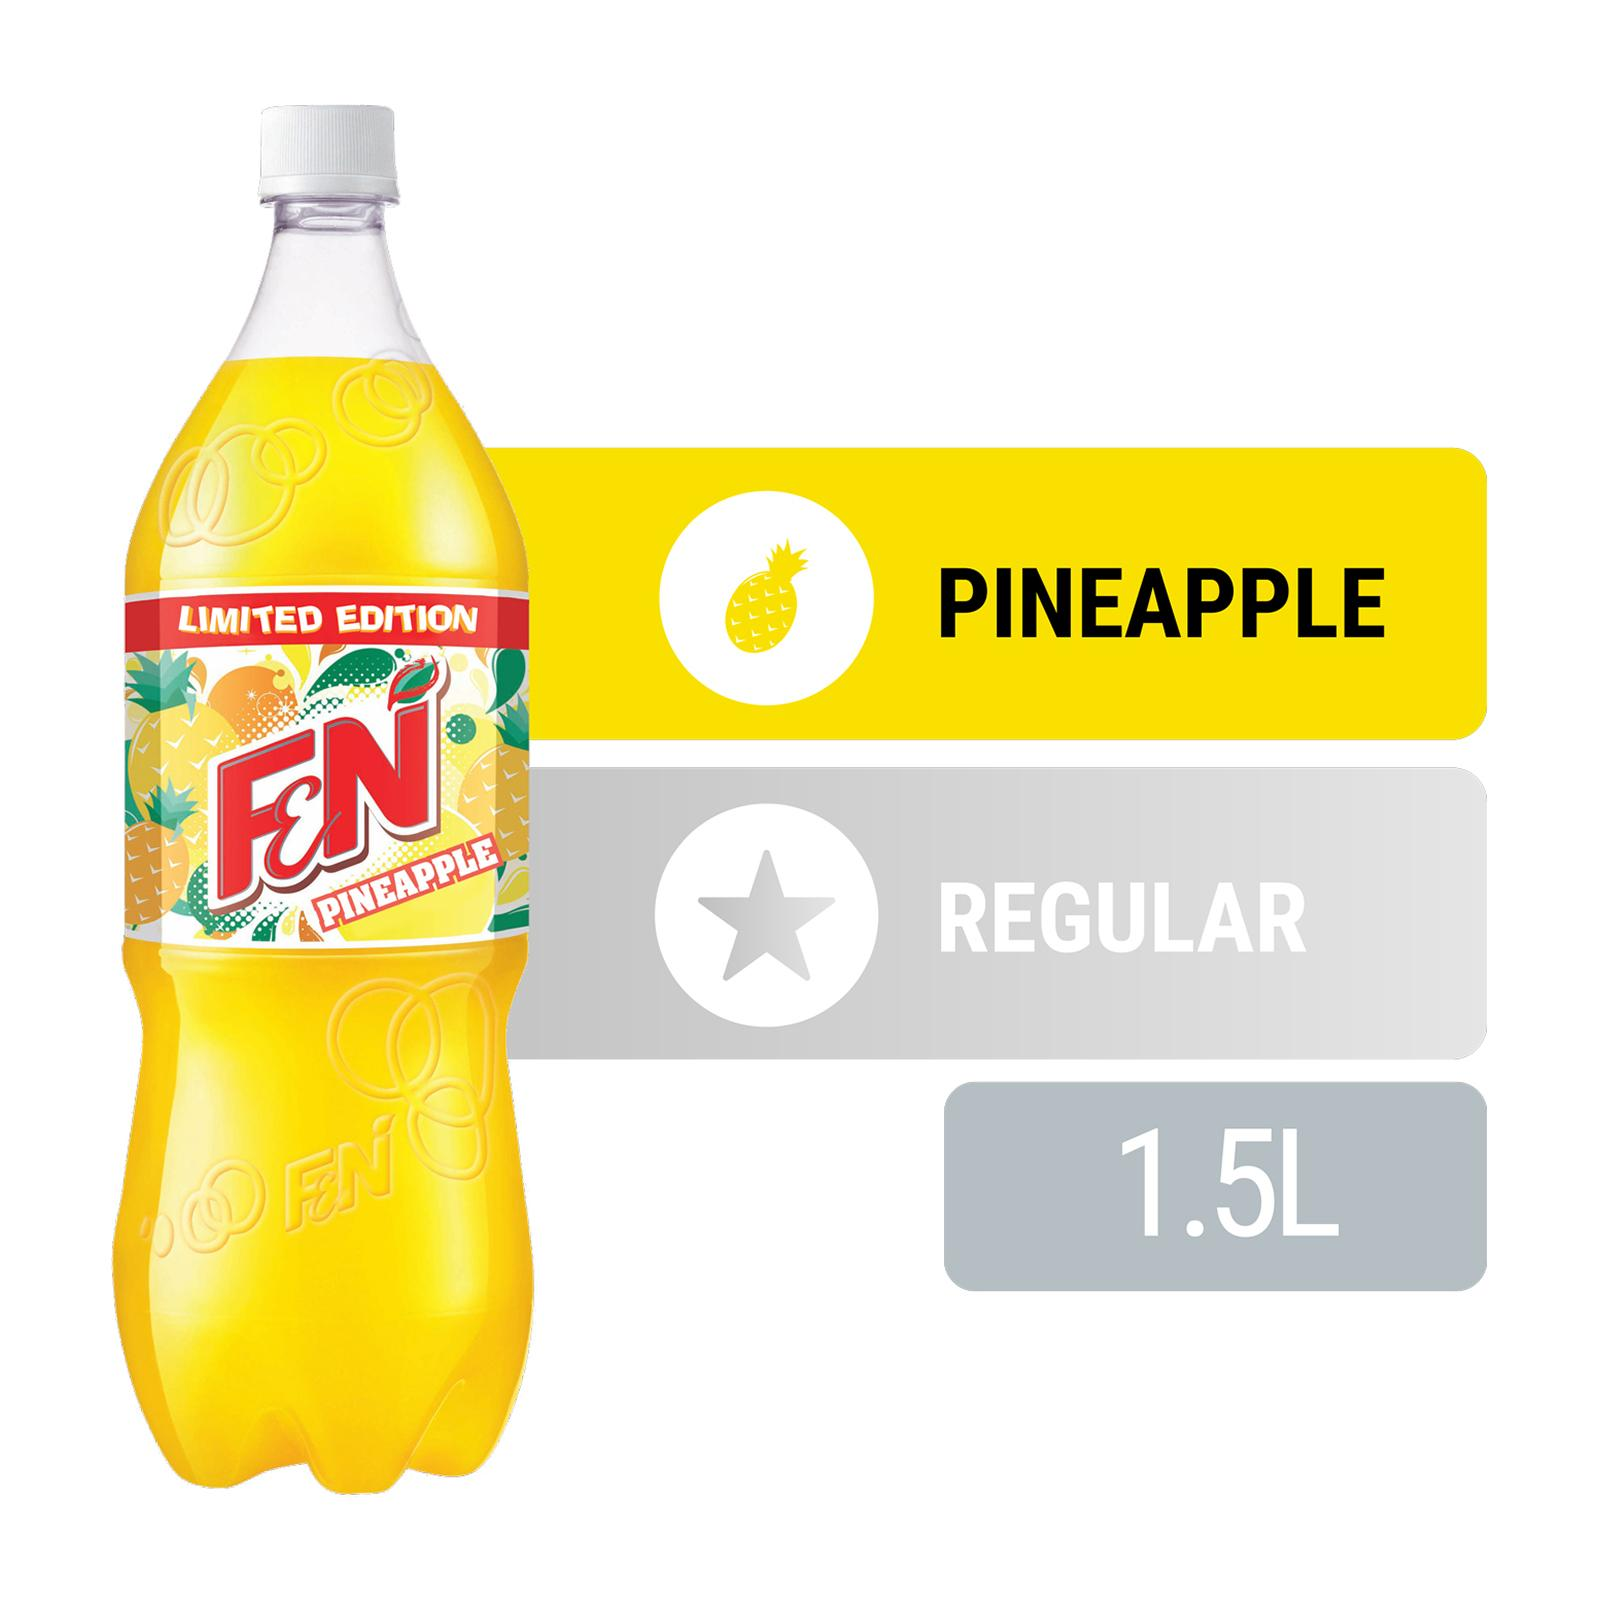 F&N Sparkling Pineapple